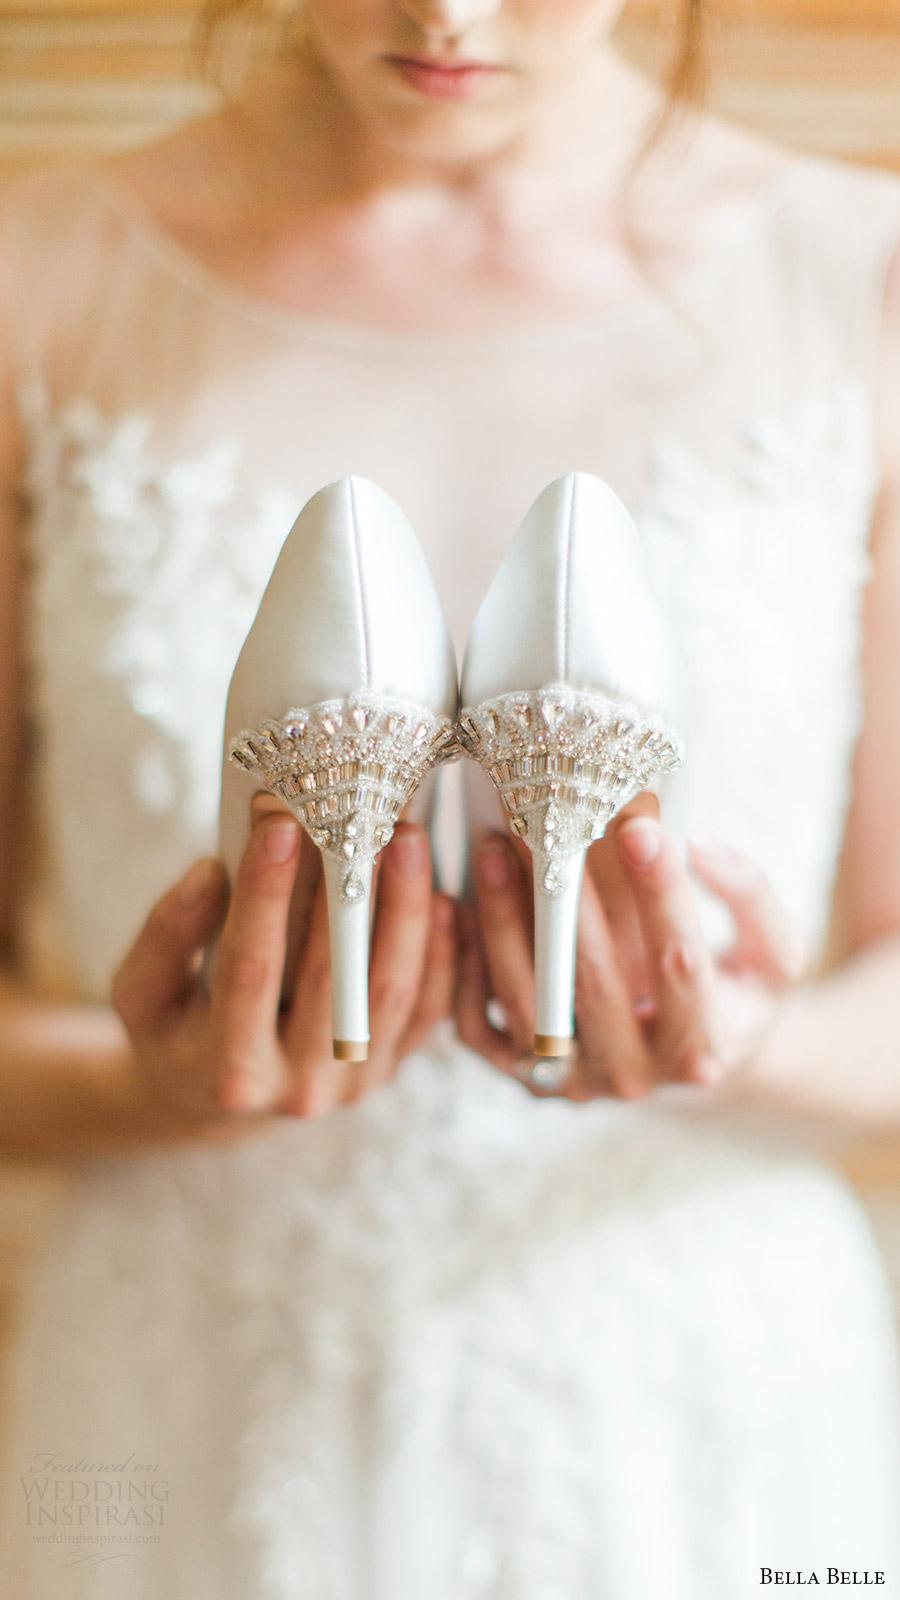 65b56fff1 bella belle bridal shoes 2016 elizabeth wedding pumps beaded heels